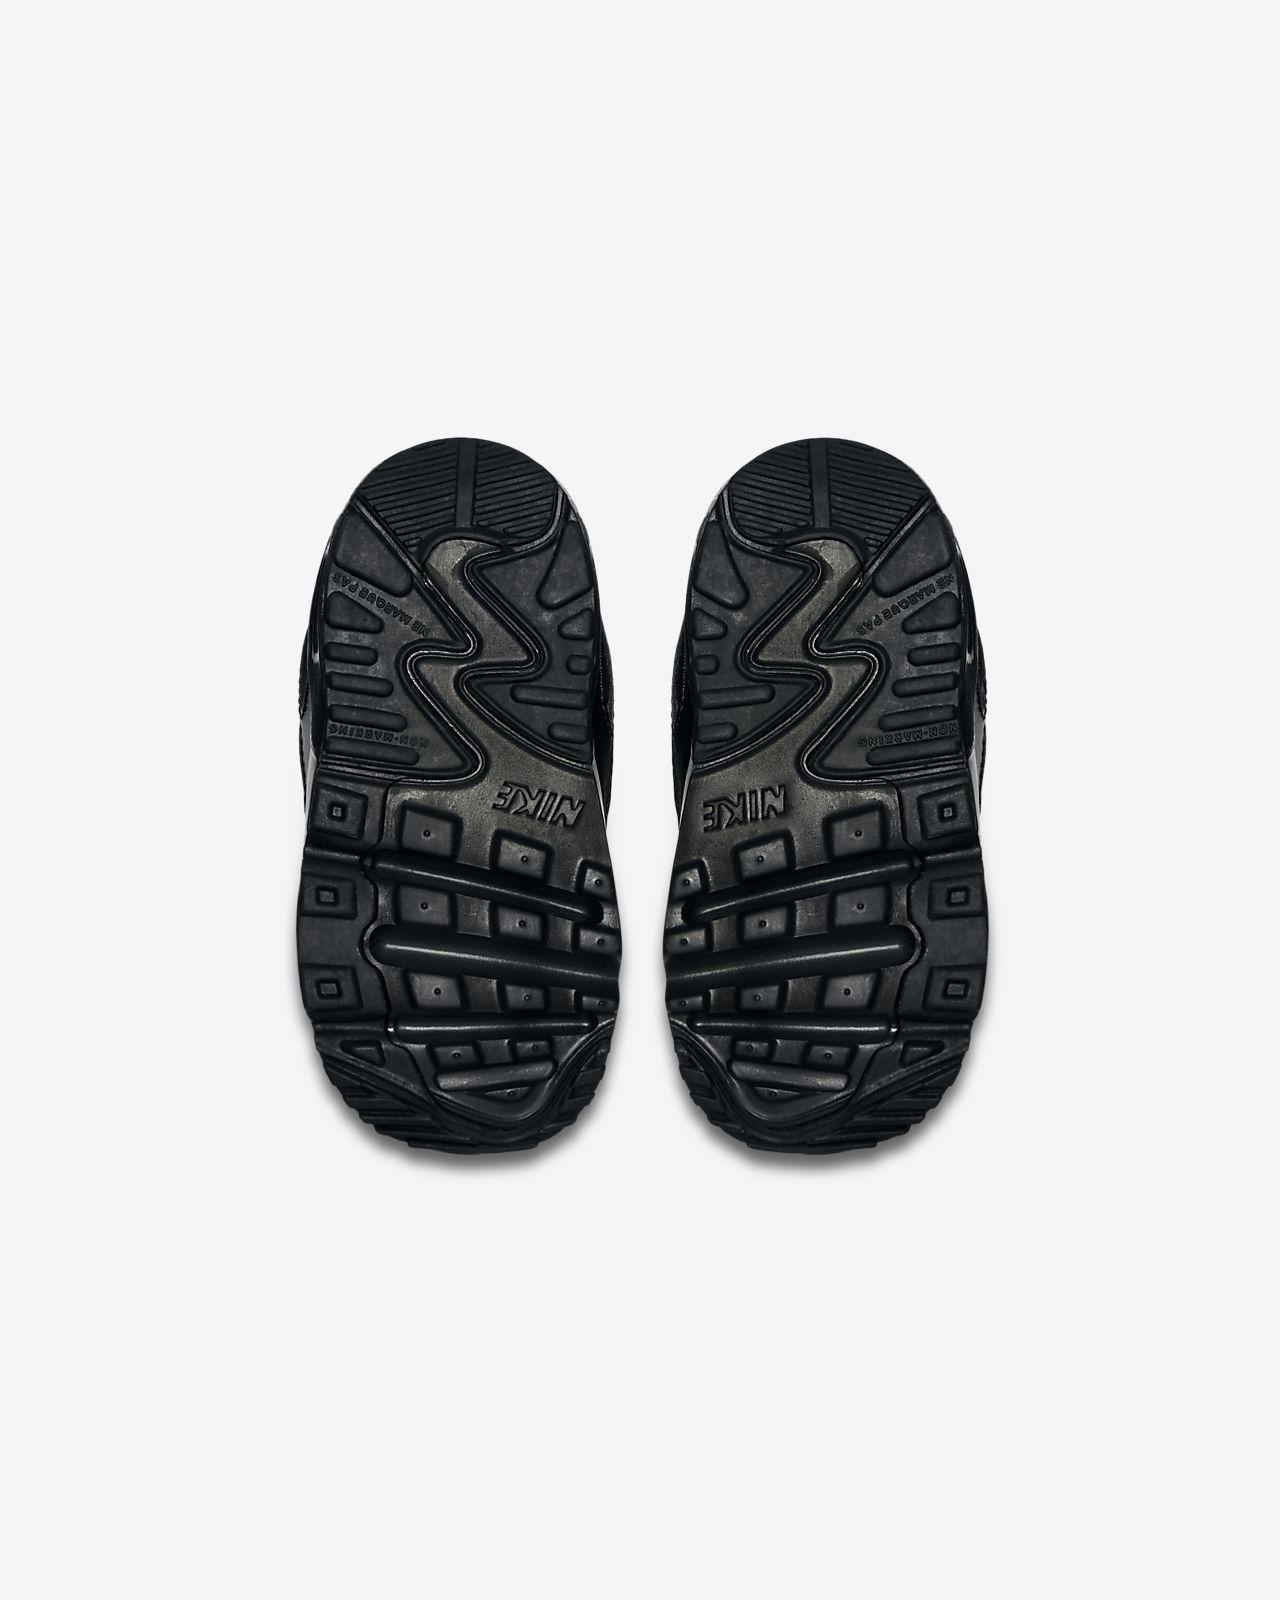 Entdecke Nike Air max tavas Österreich Shop: Die Kollektion